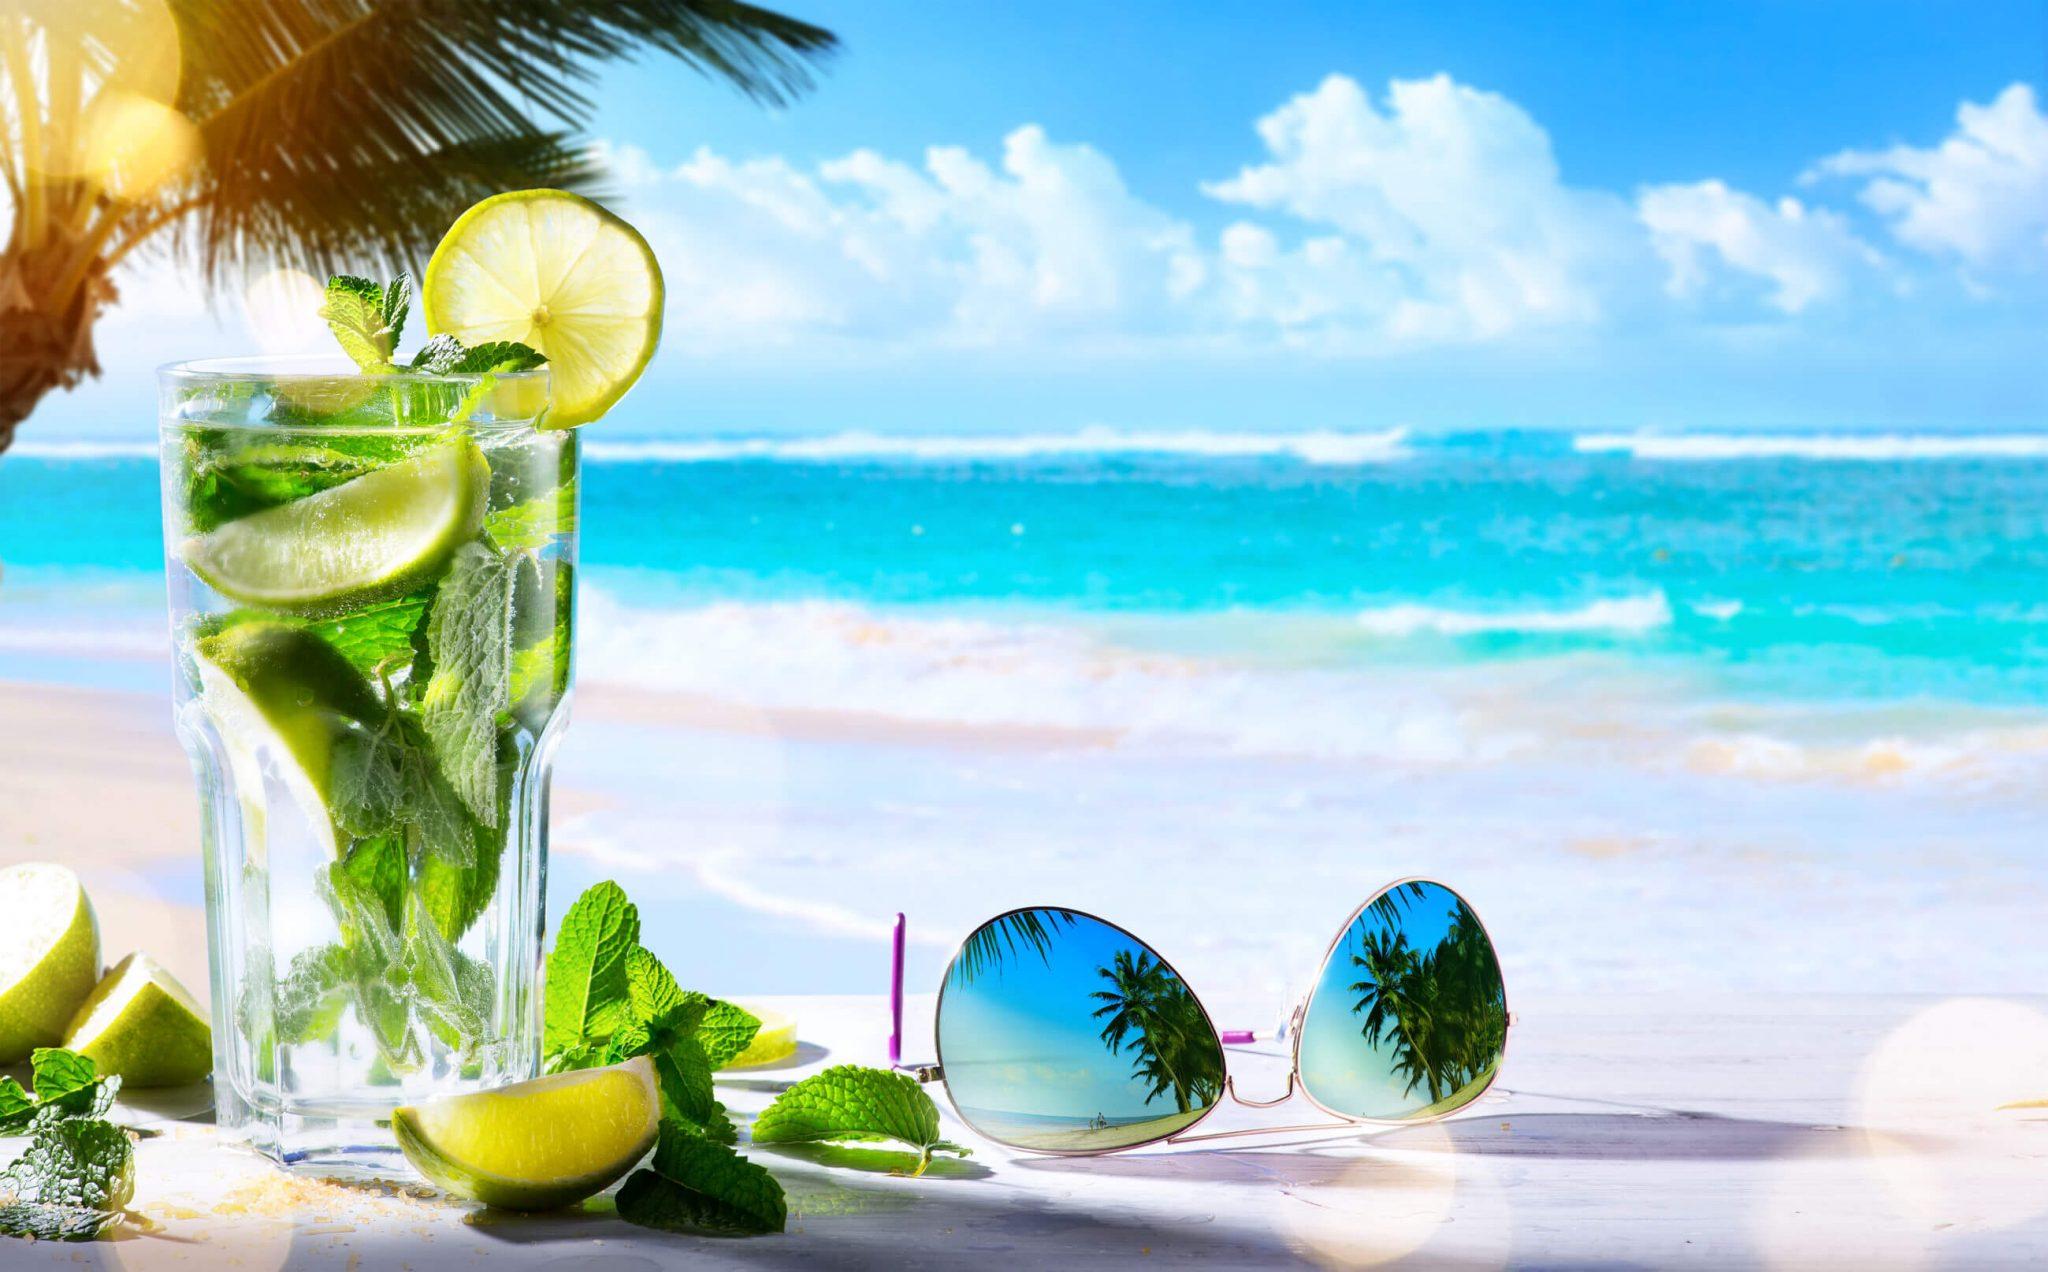 tropical beach party theme